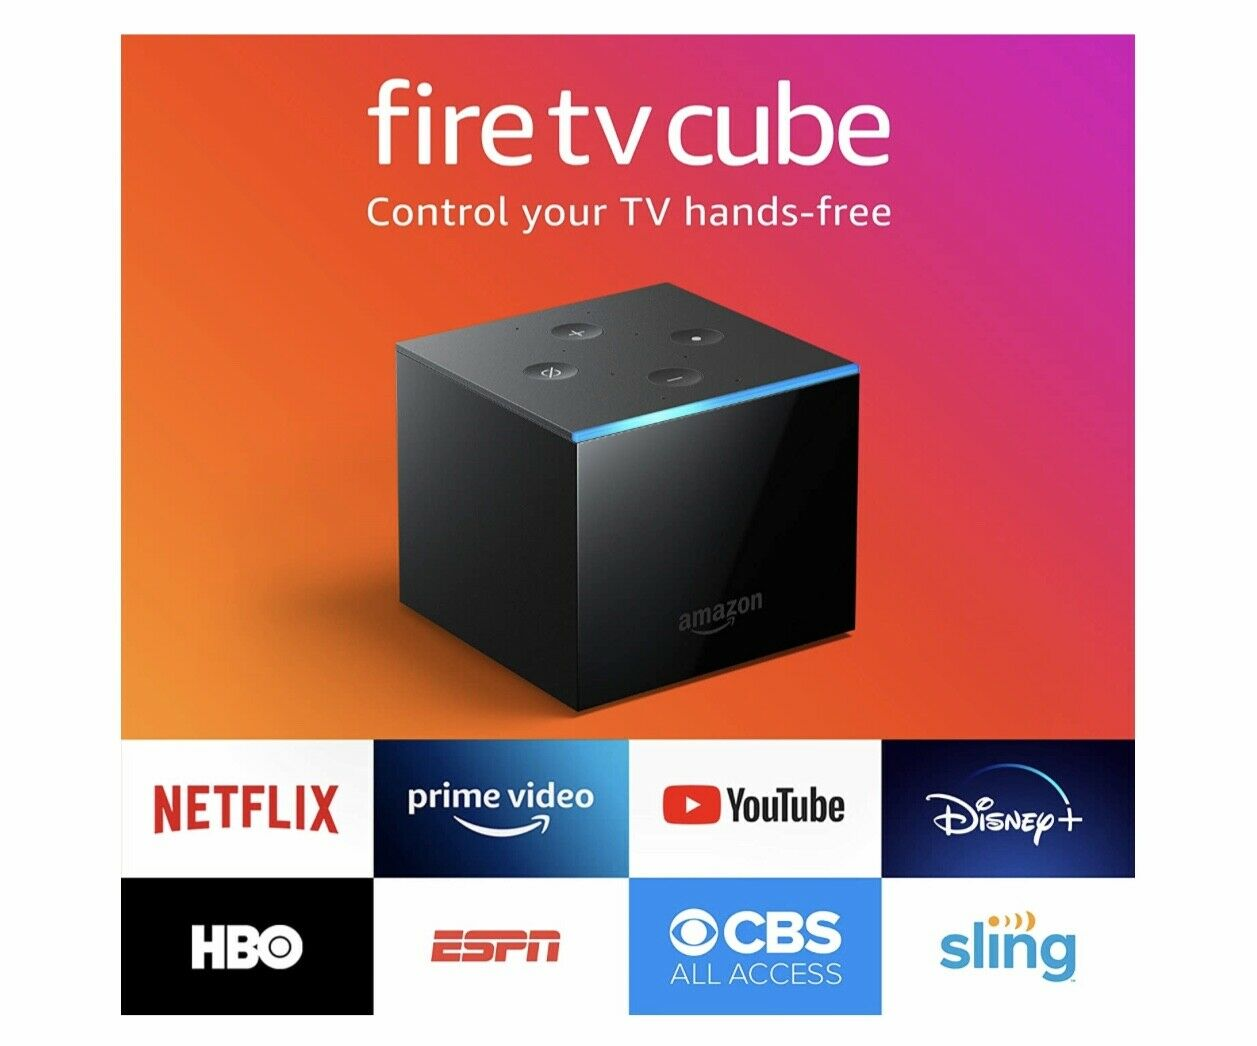 Amazon Fire TV Cube (2nd Generation) 16GB 4K UHD Streaming Media Player! NEW! 16gb amazon cube fire media streaming uhd